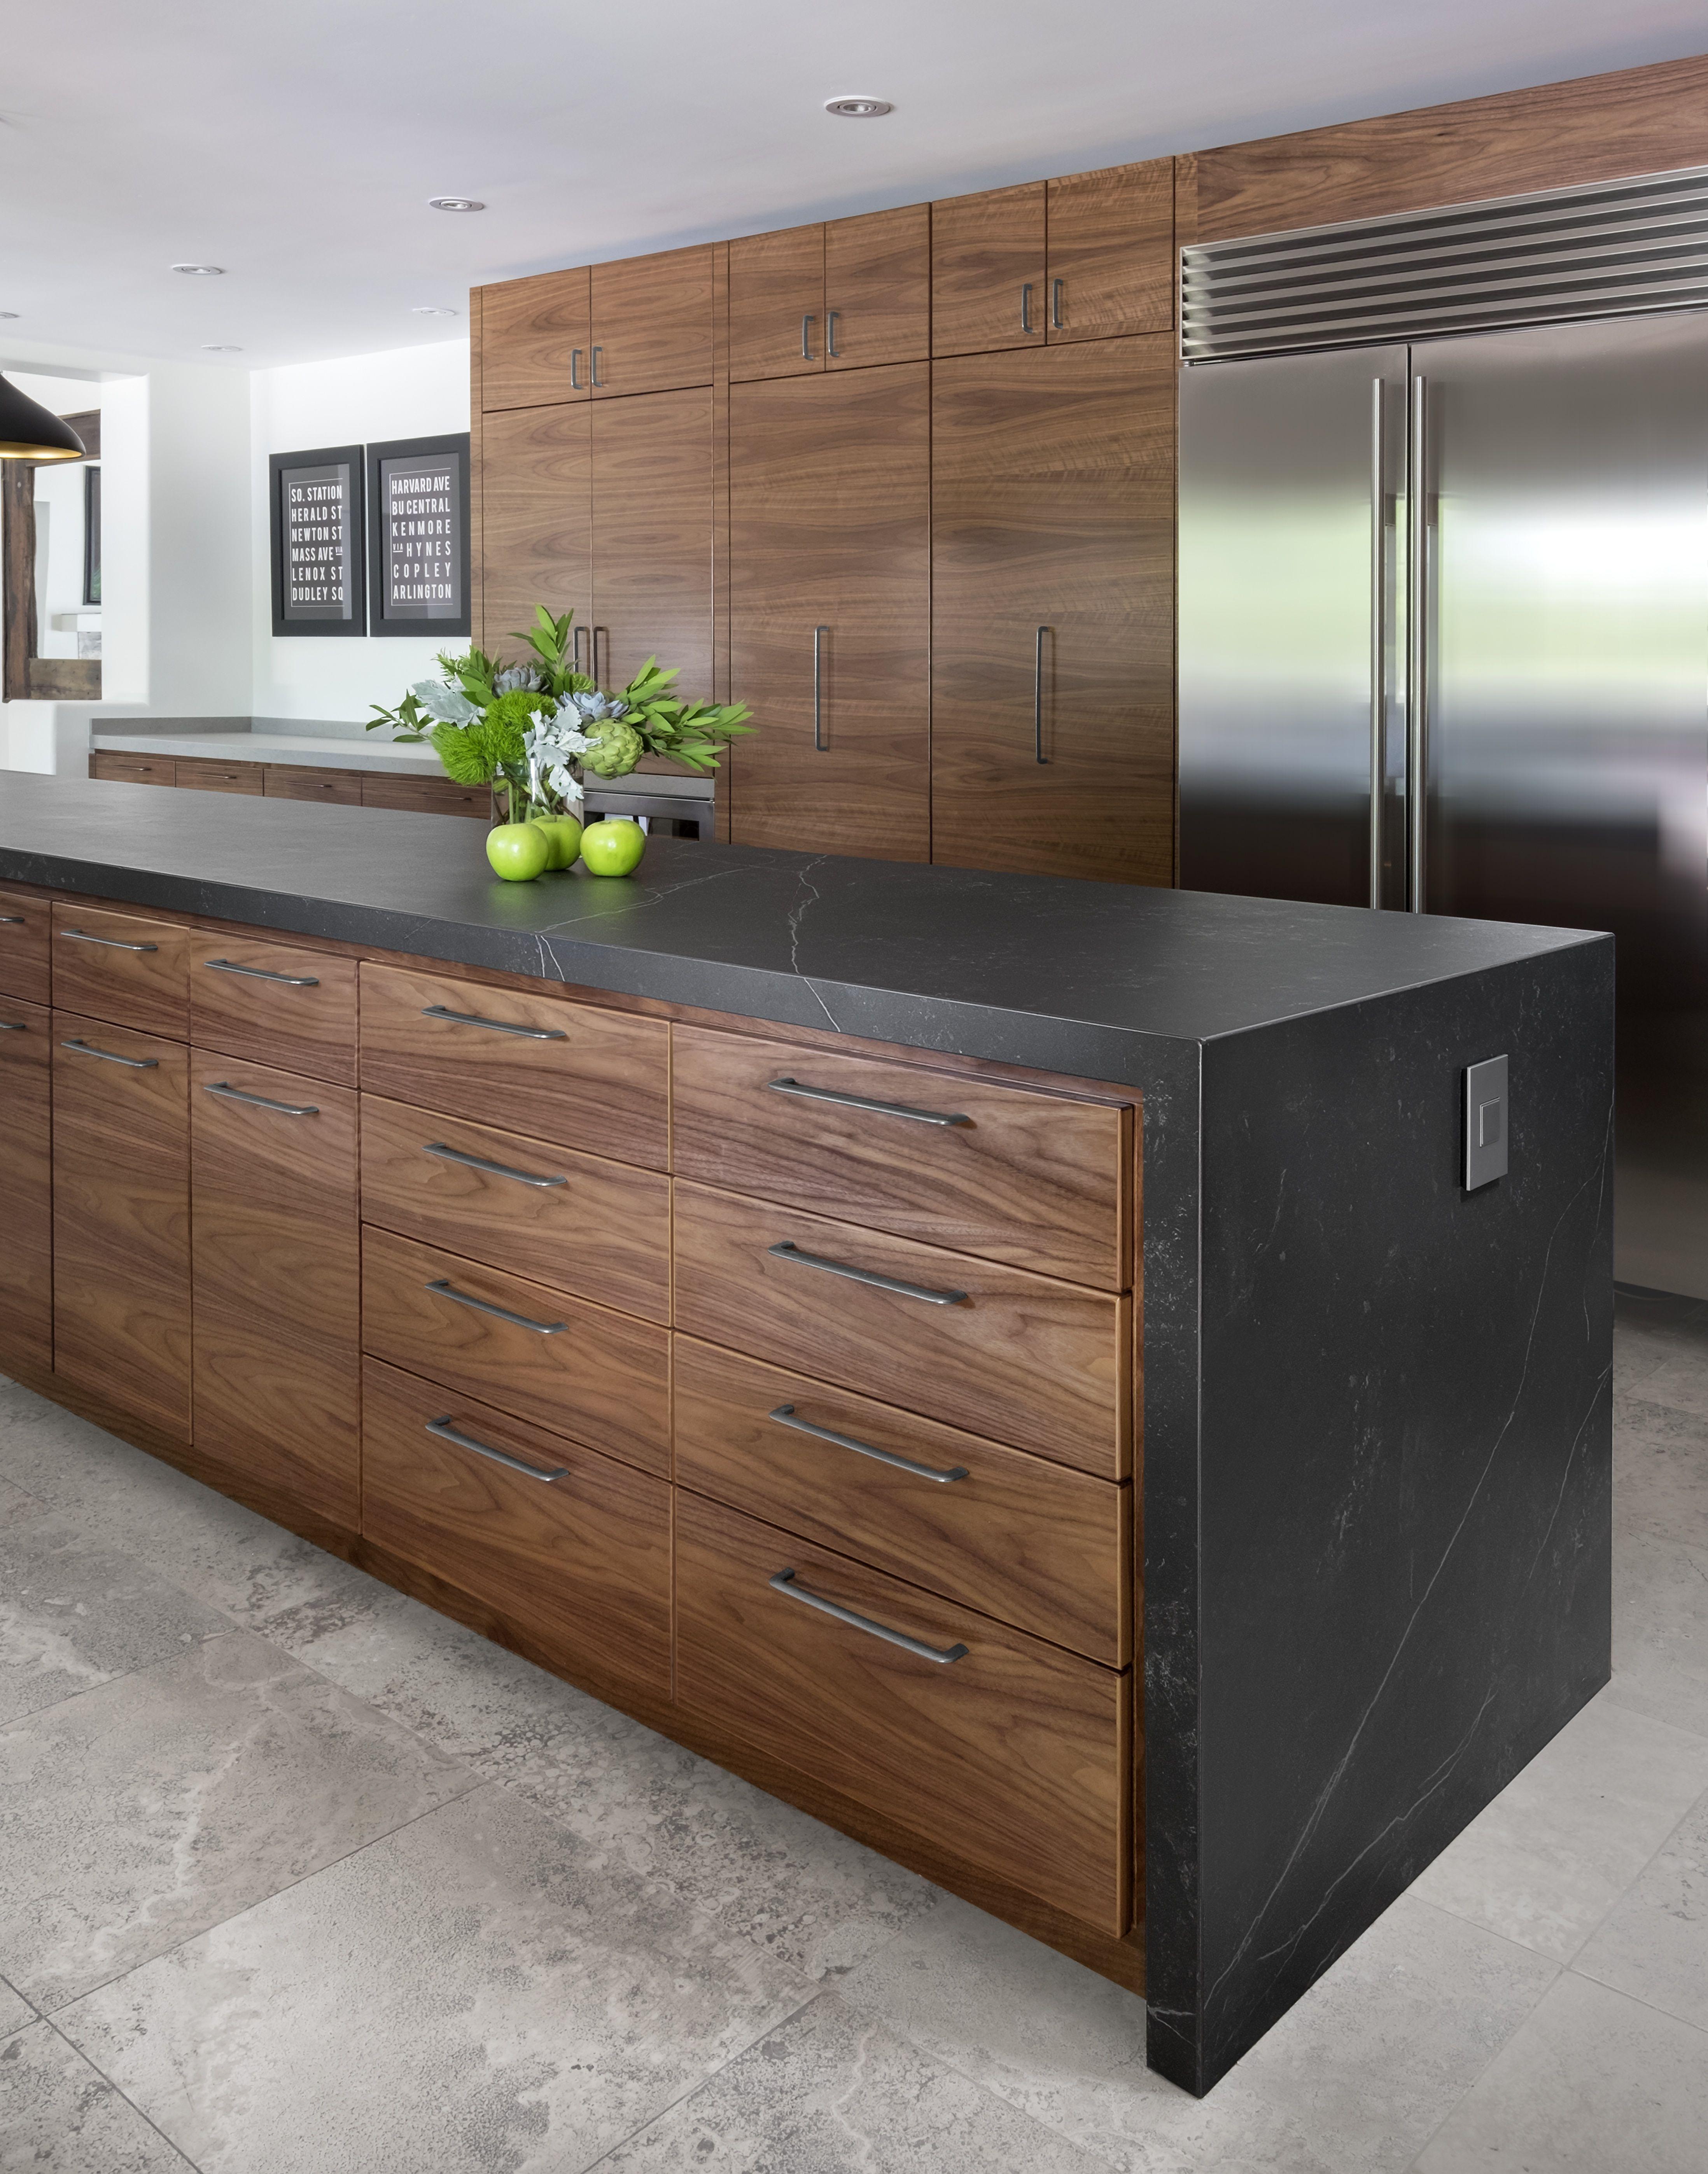 Dekton Kitchen Reveal by Daniel Germani   Cosentino USA   Kitchen ...